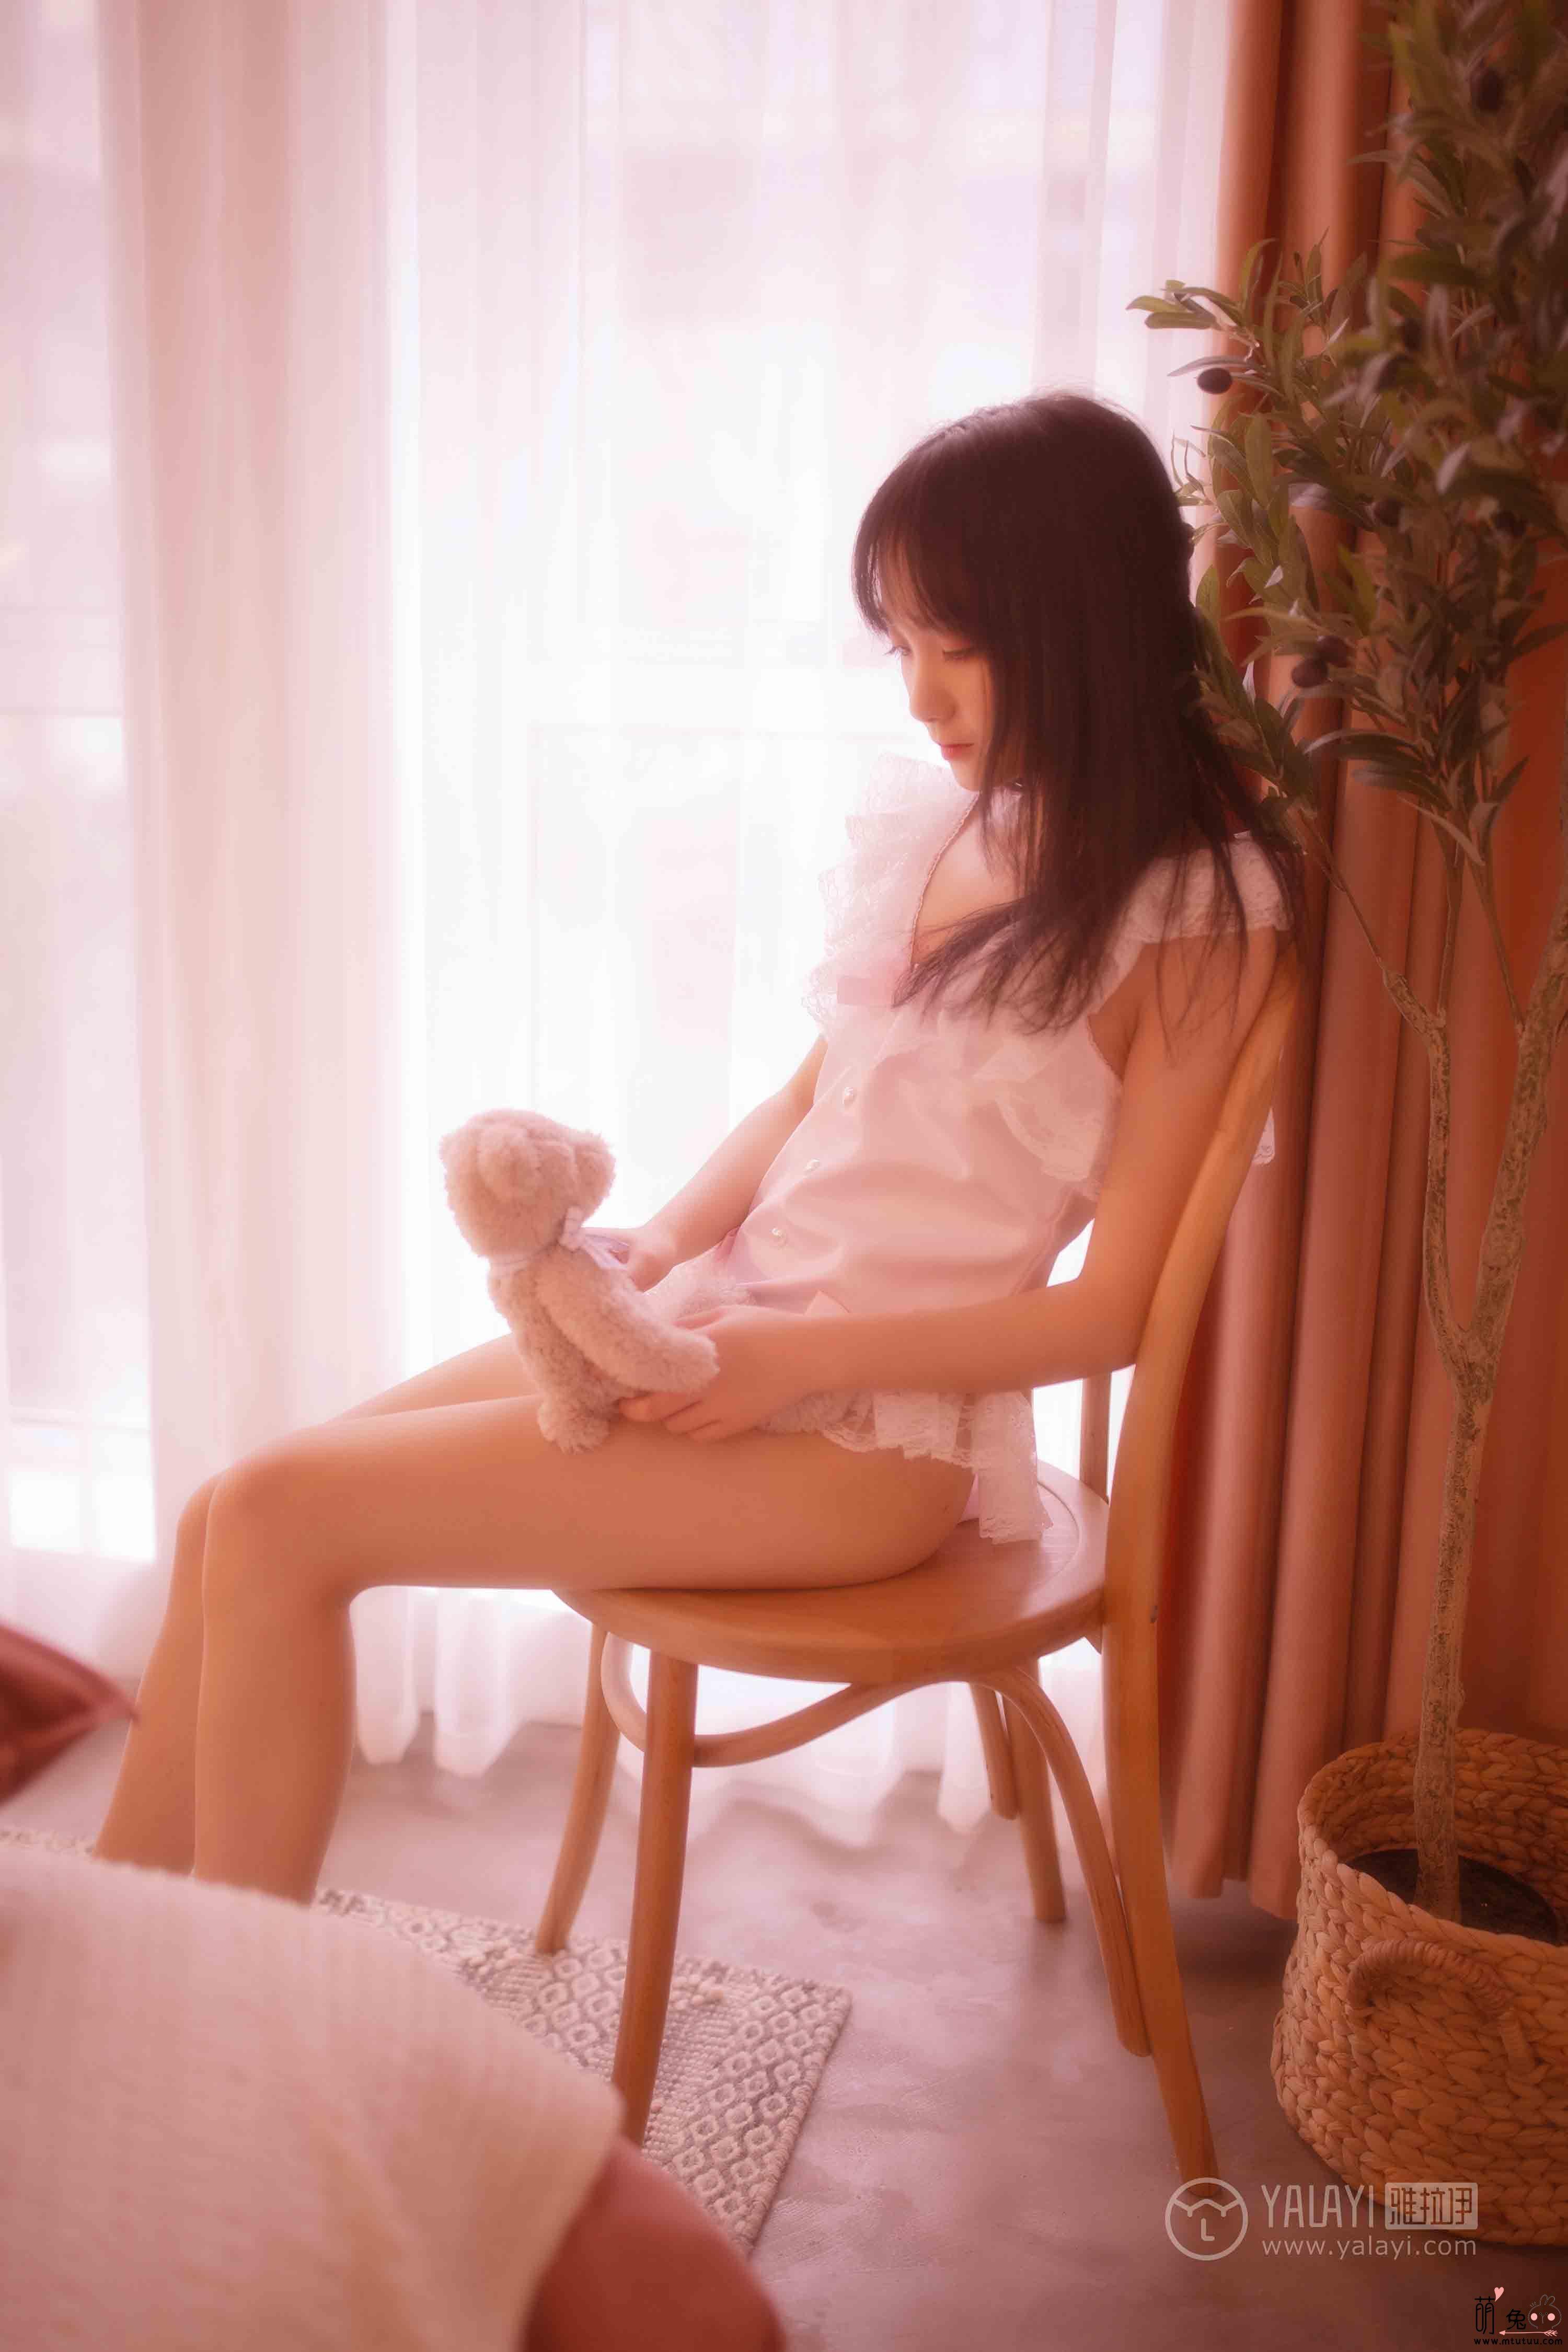 YALAYI雅拉伊No.44-夏夏-薄紗少女(45P 382M)